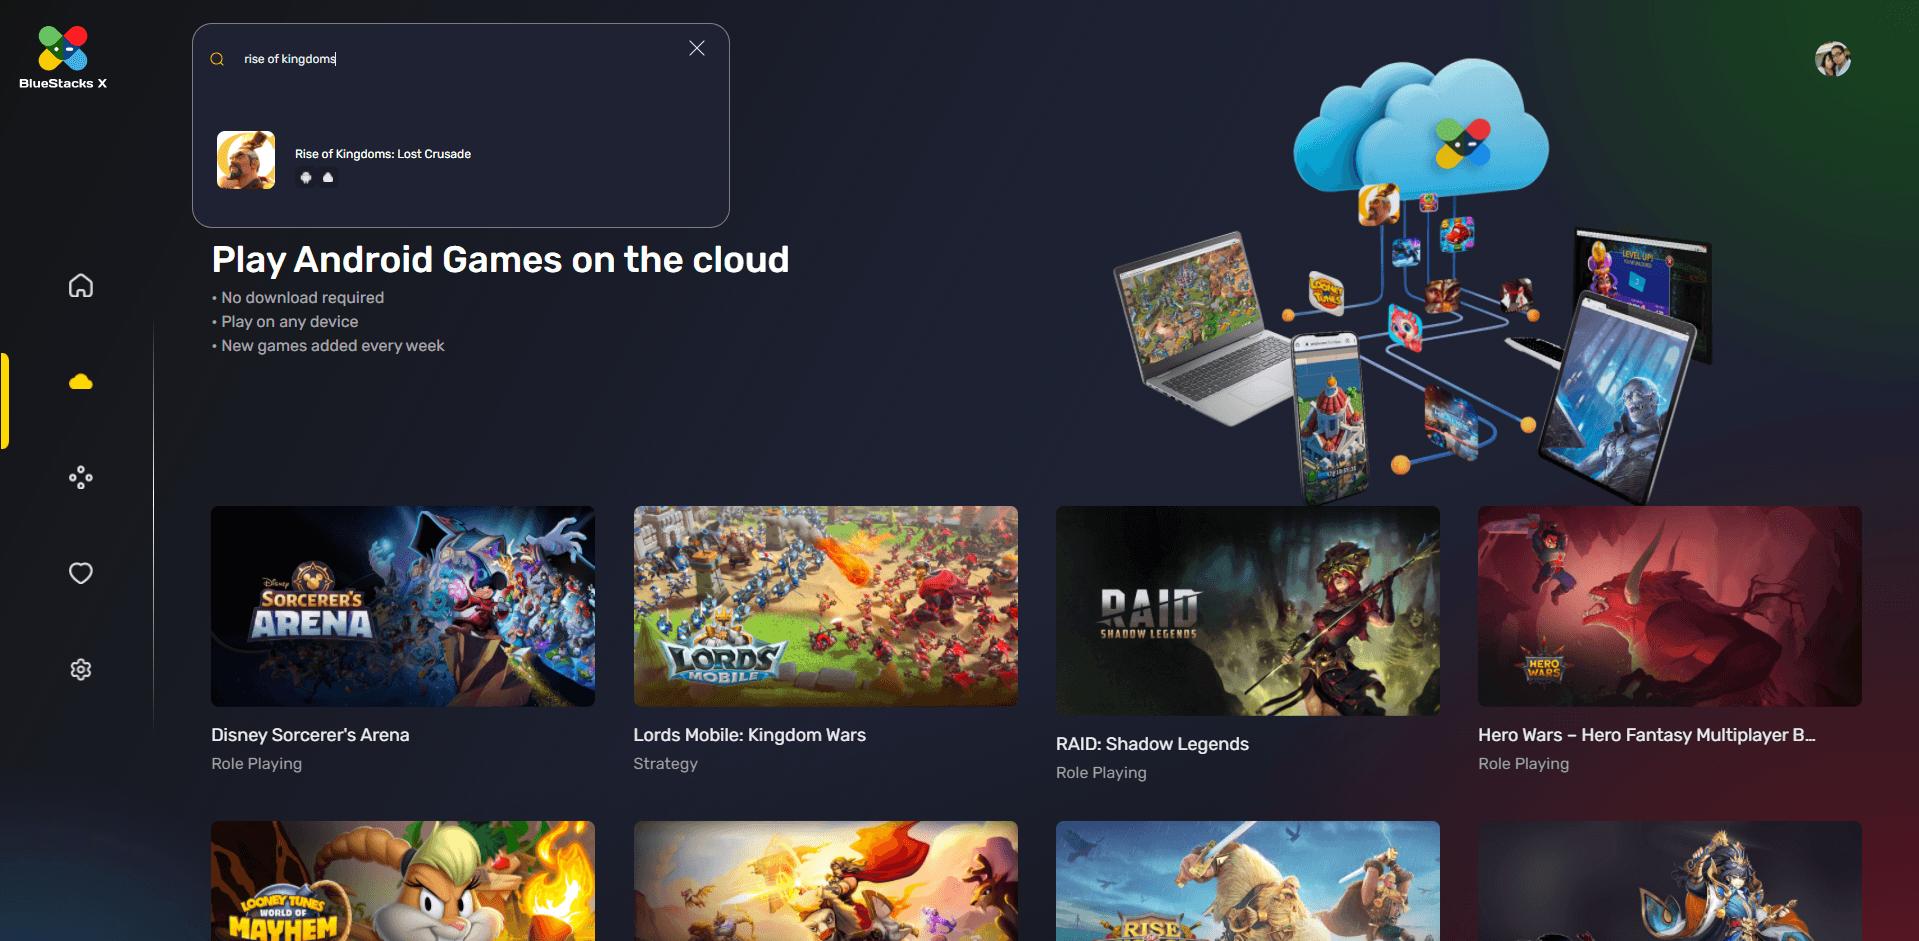 So spielst du Rise of Kingdoms in der Cloud mit BlueStacks X